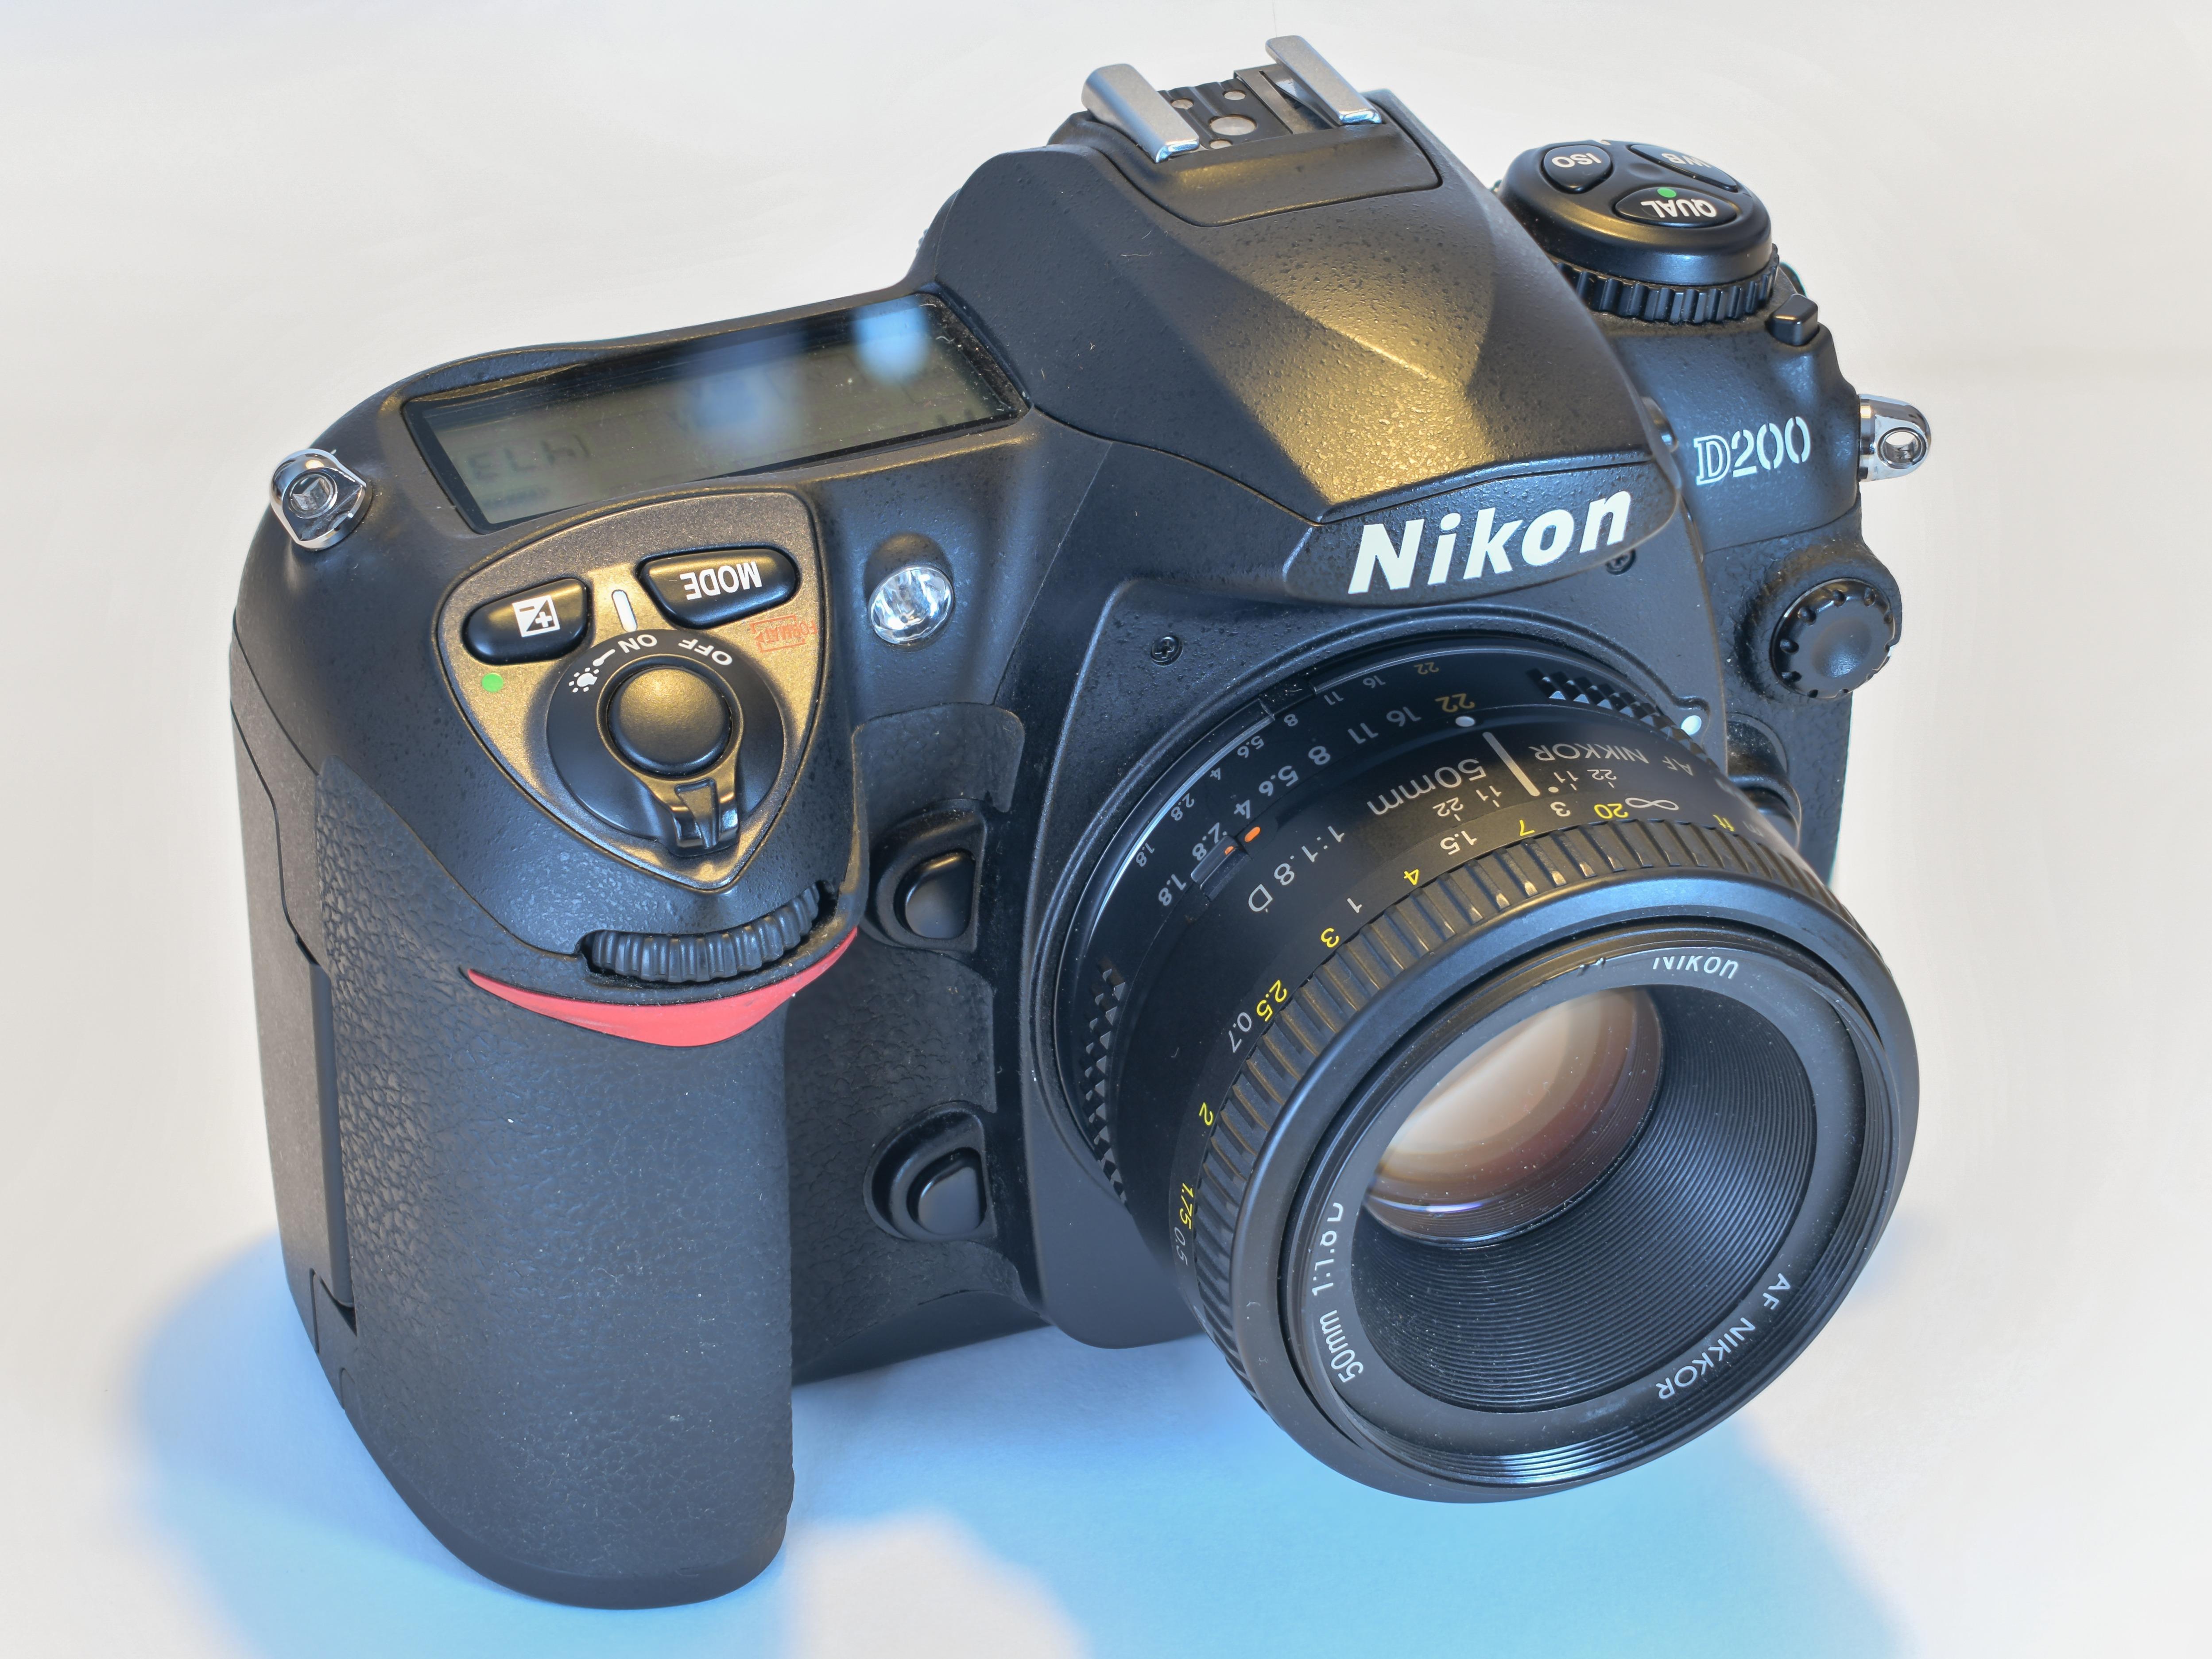 Nikon D200 Wikipédia